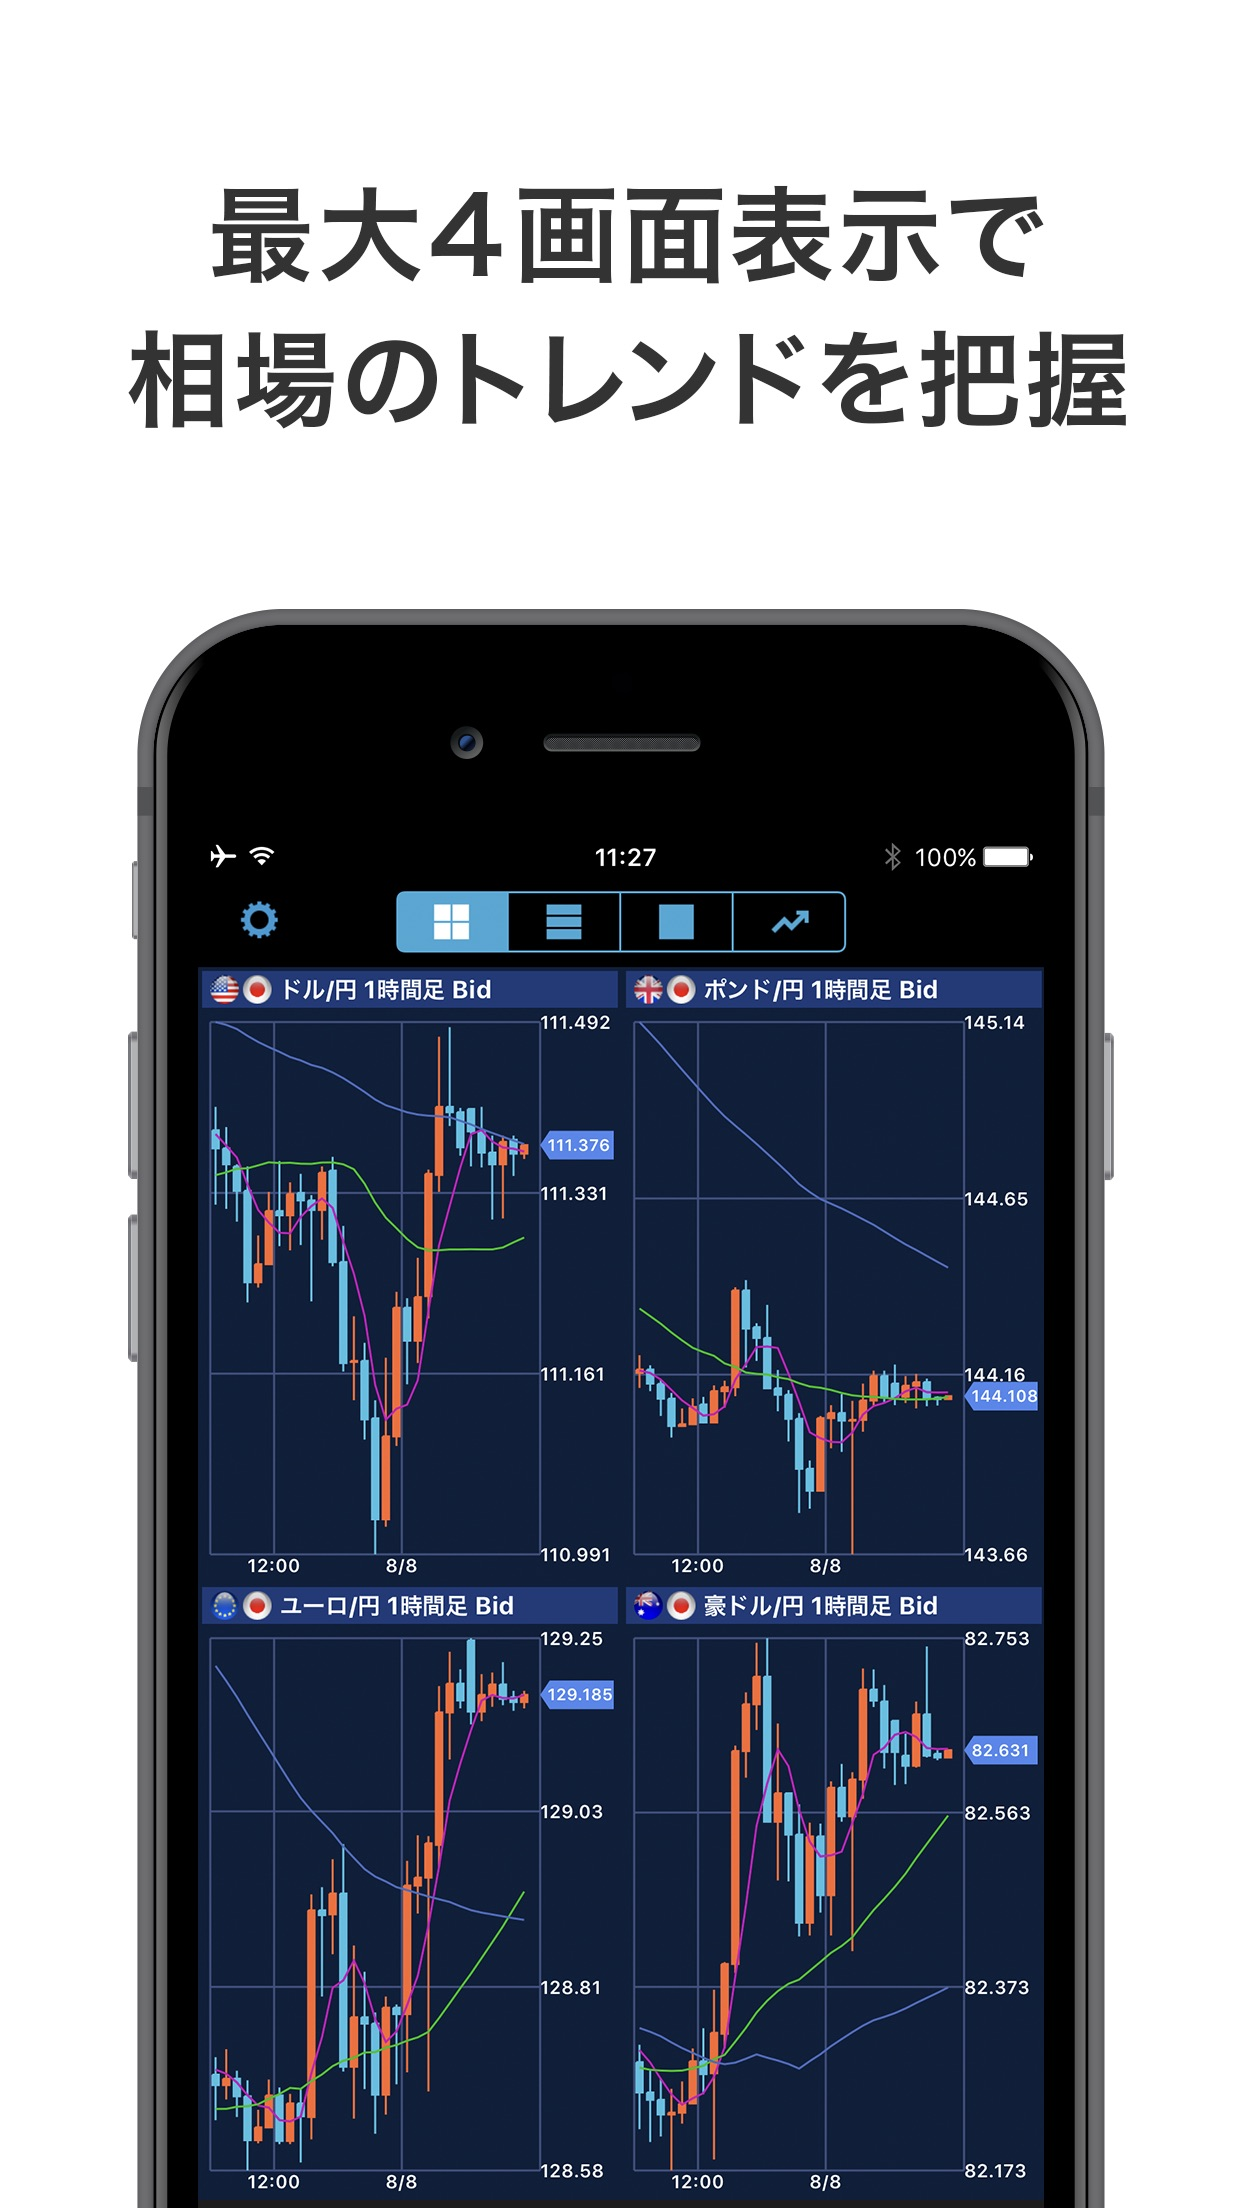 iSPEED FX - 楽天証券のFXアプリ Screenshot